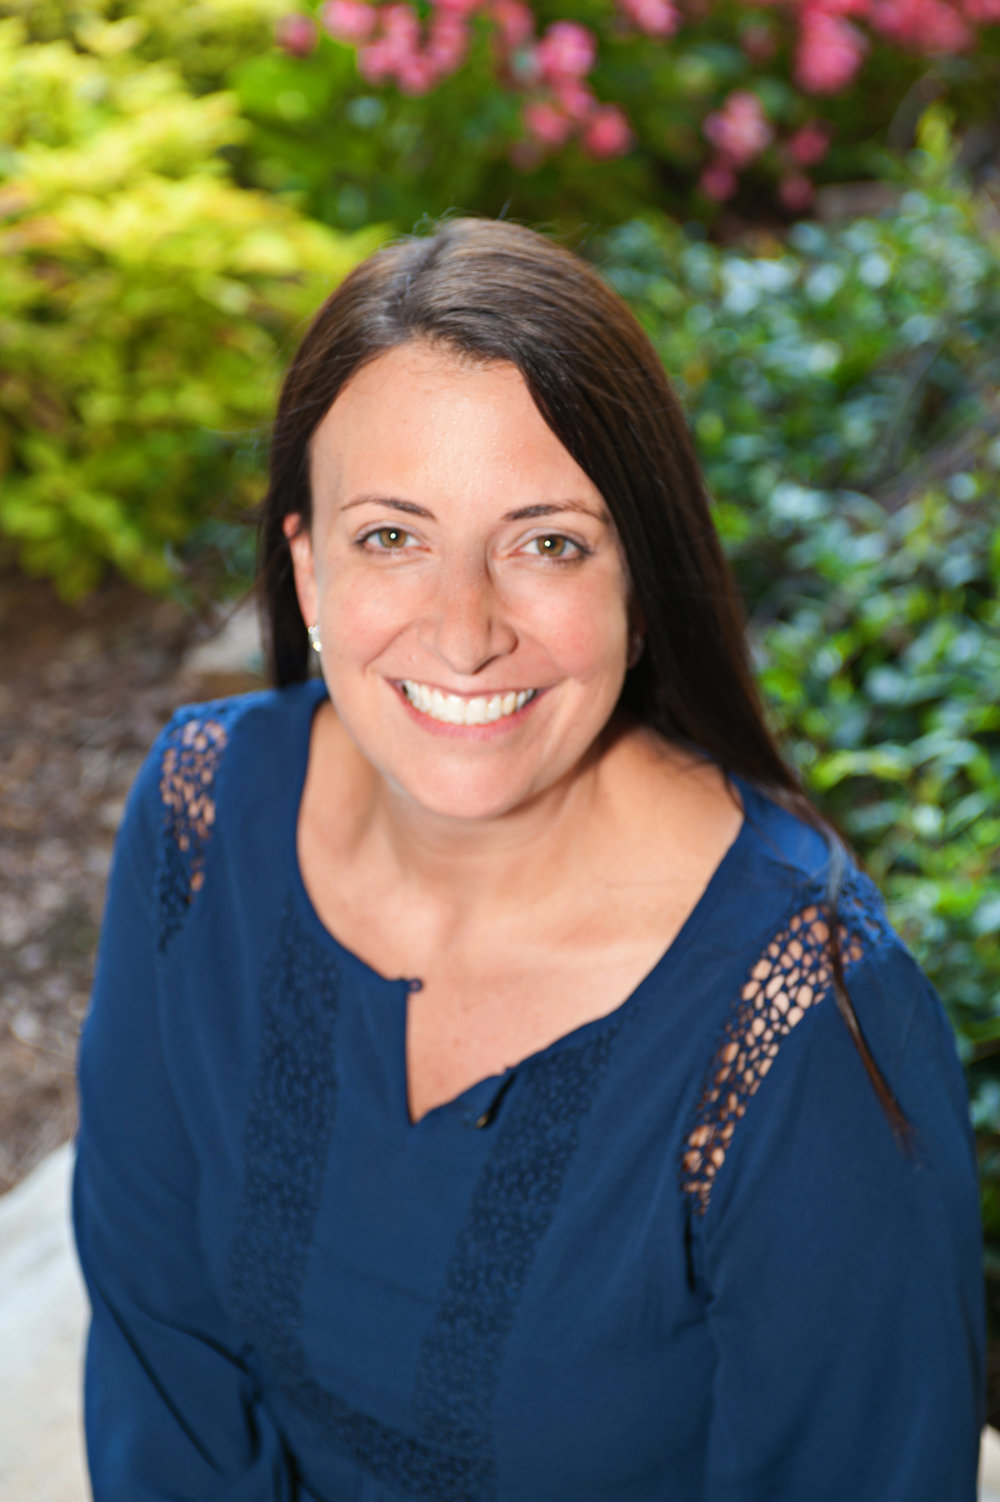 Rebecca-Zion-aquesst-recruiting-dunwoody-sandy-springs-ga.jpg